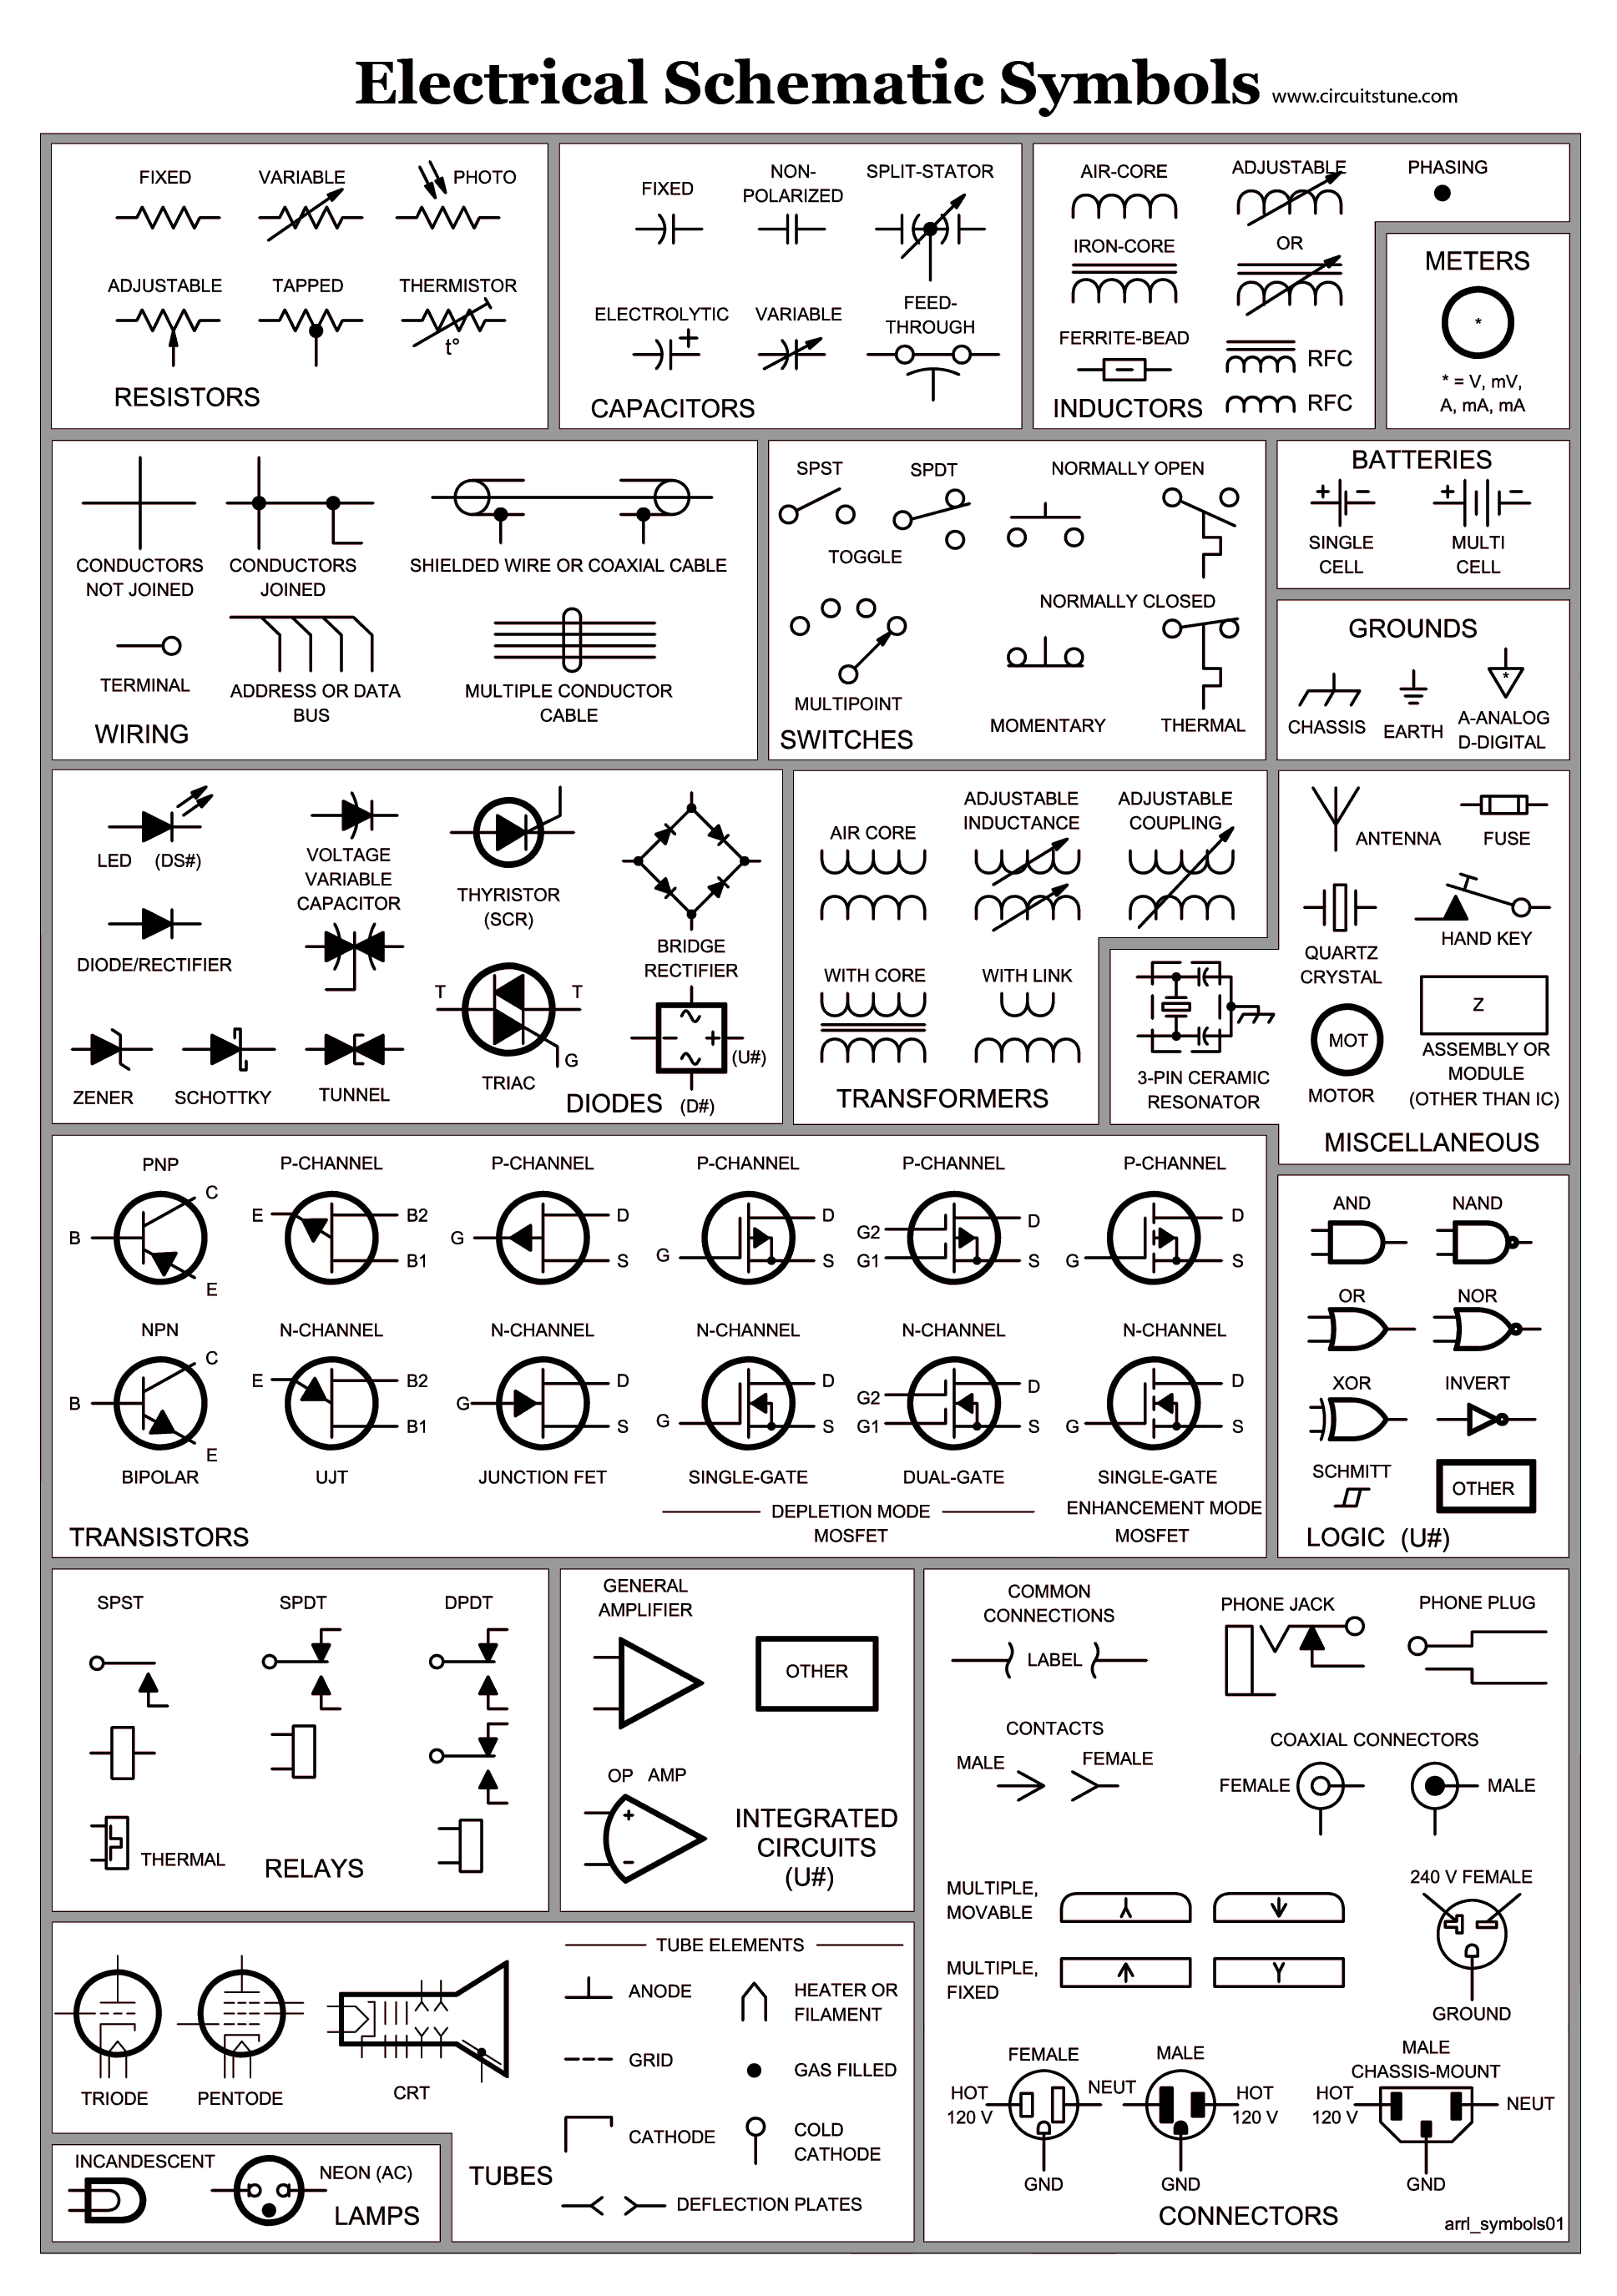 Electrical Blueprint Symbol : electrical, blueprint, symbol, Wiring, Diagram, Symbols, Automotive,, Http://bookingritzcarlton.info/wiring-diagram-sym…, Electrical, Schematic, Symbols,, Circuit